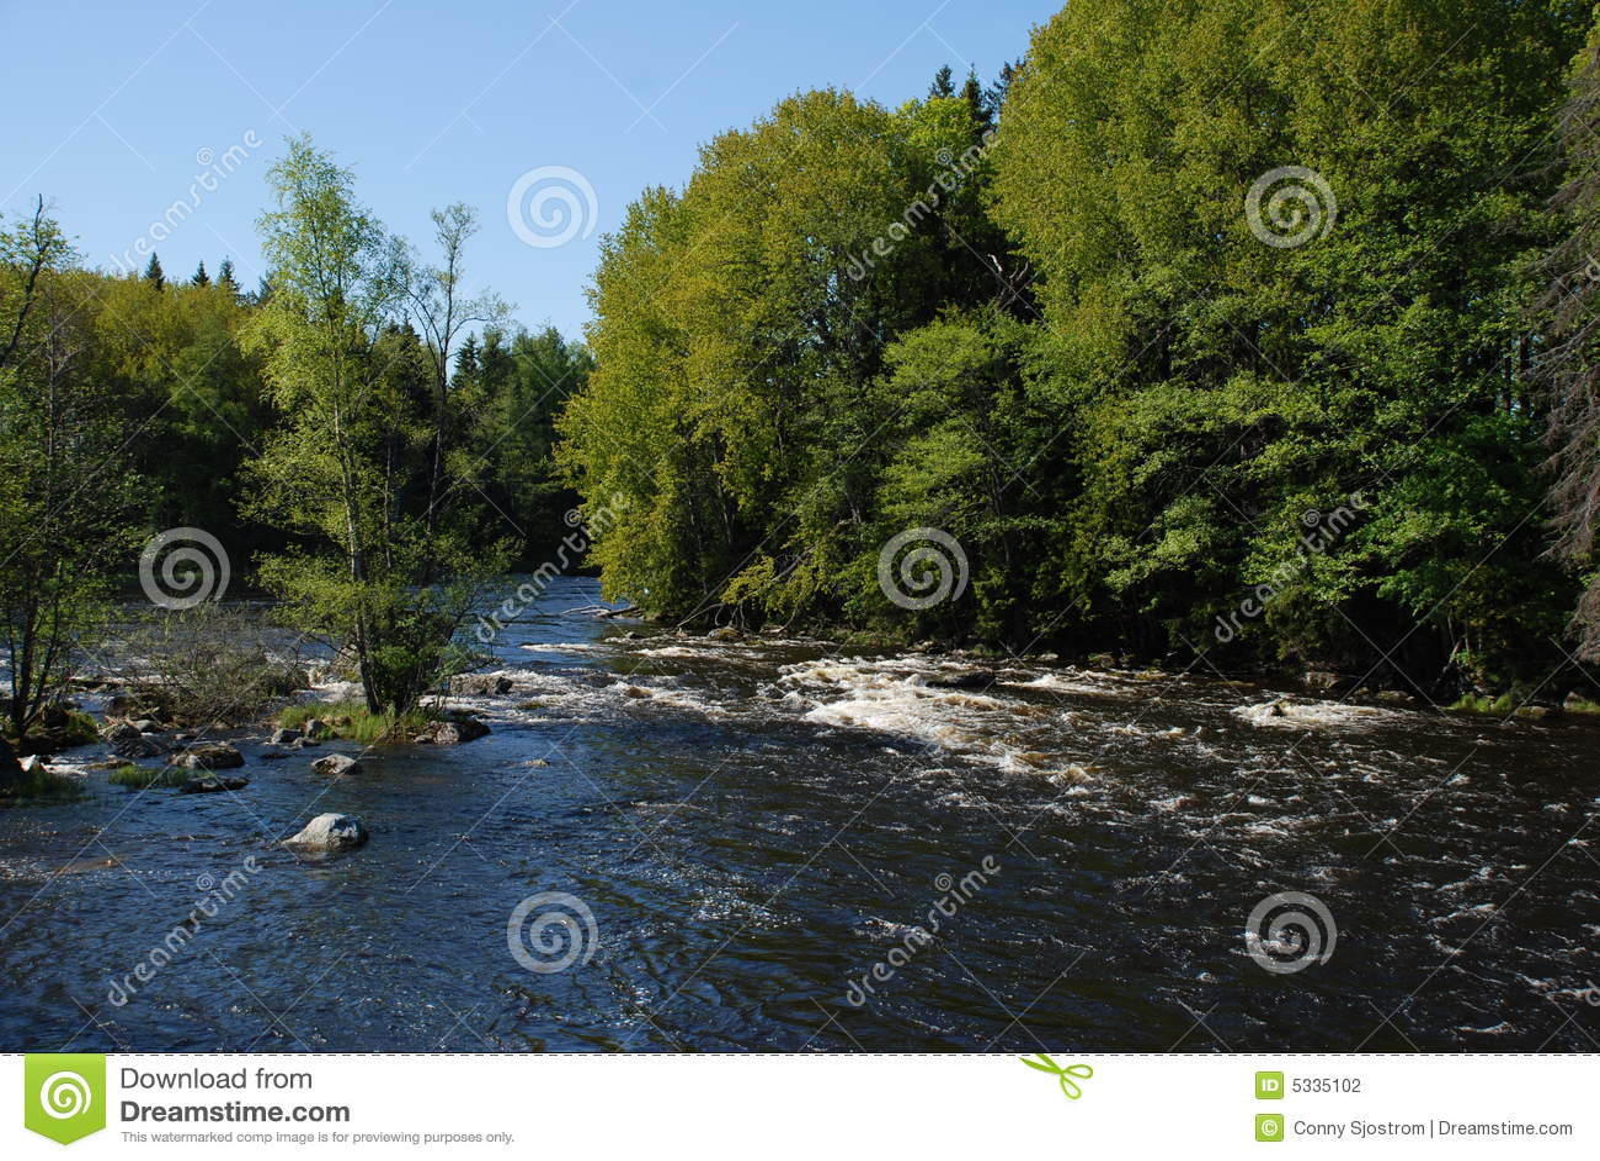 Rivier die in de Lente stroomt